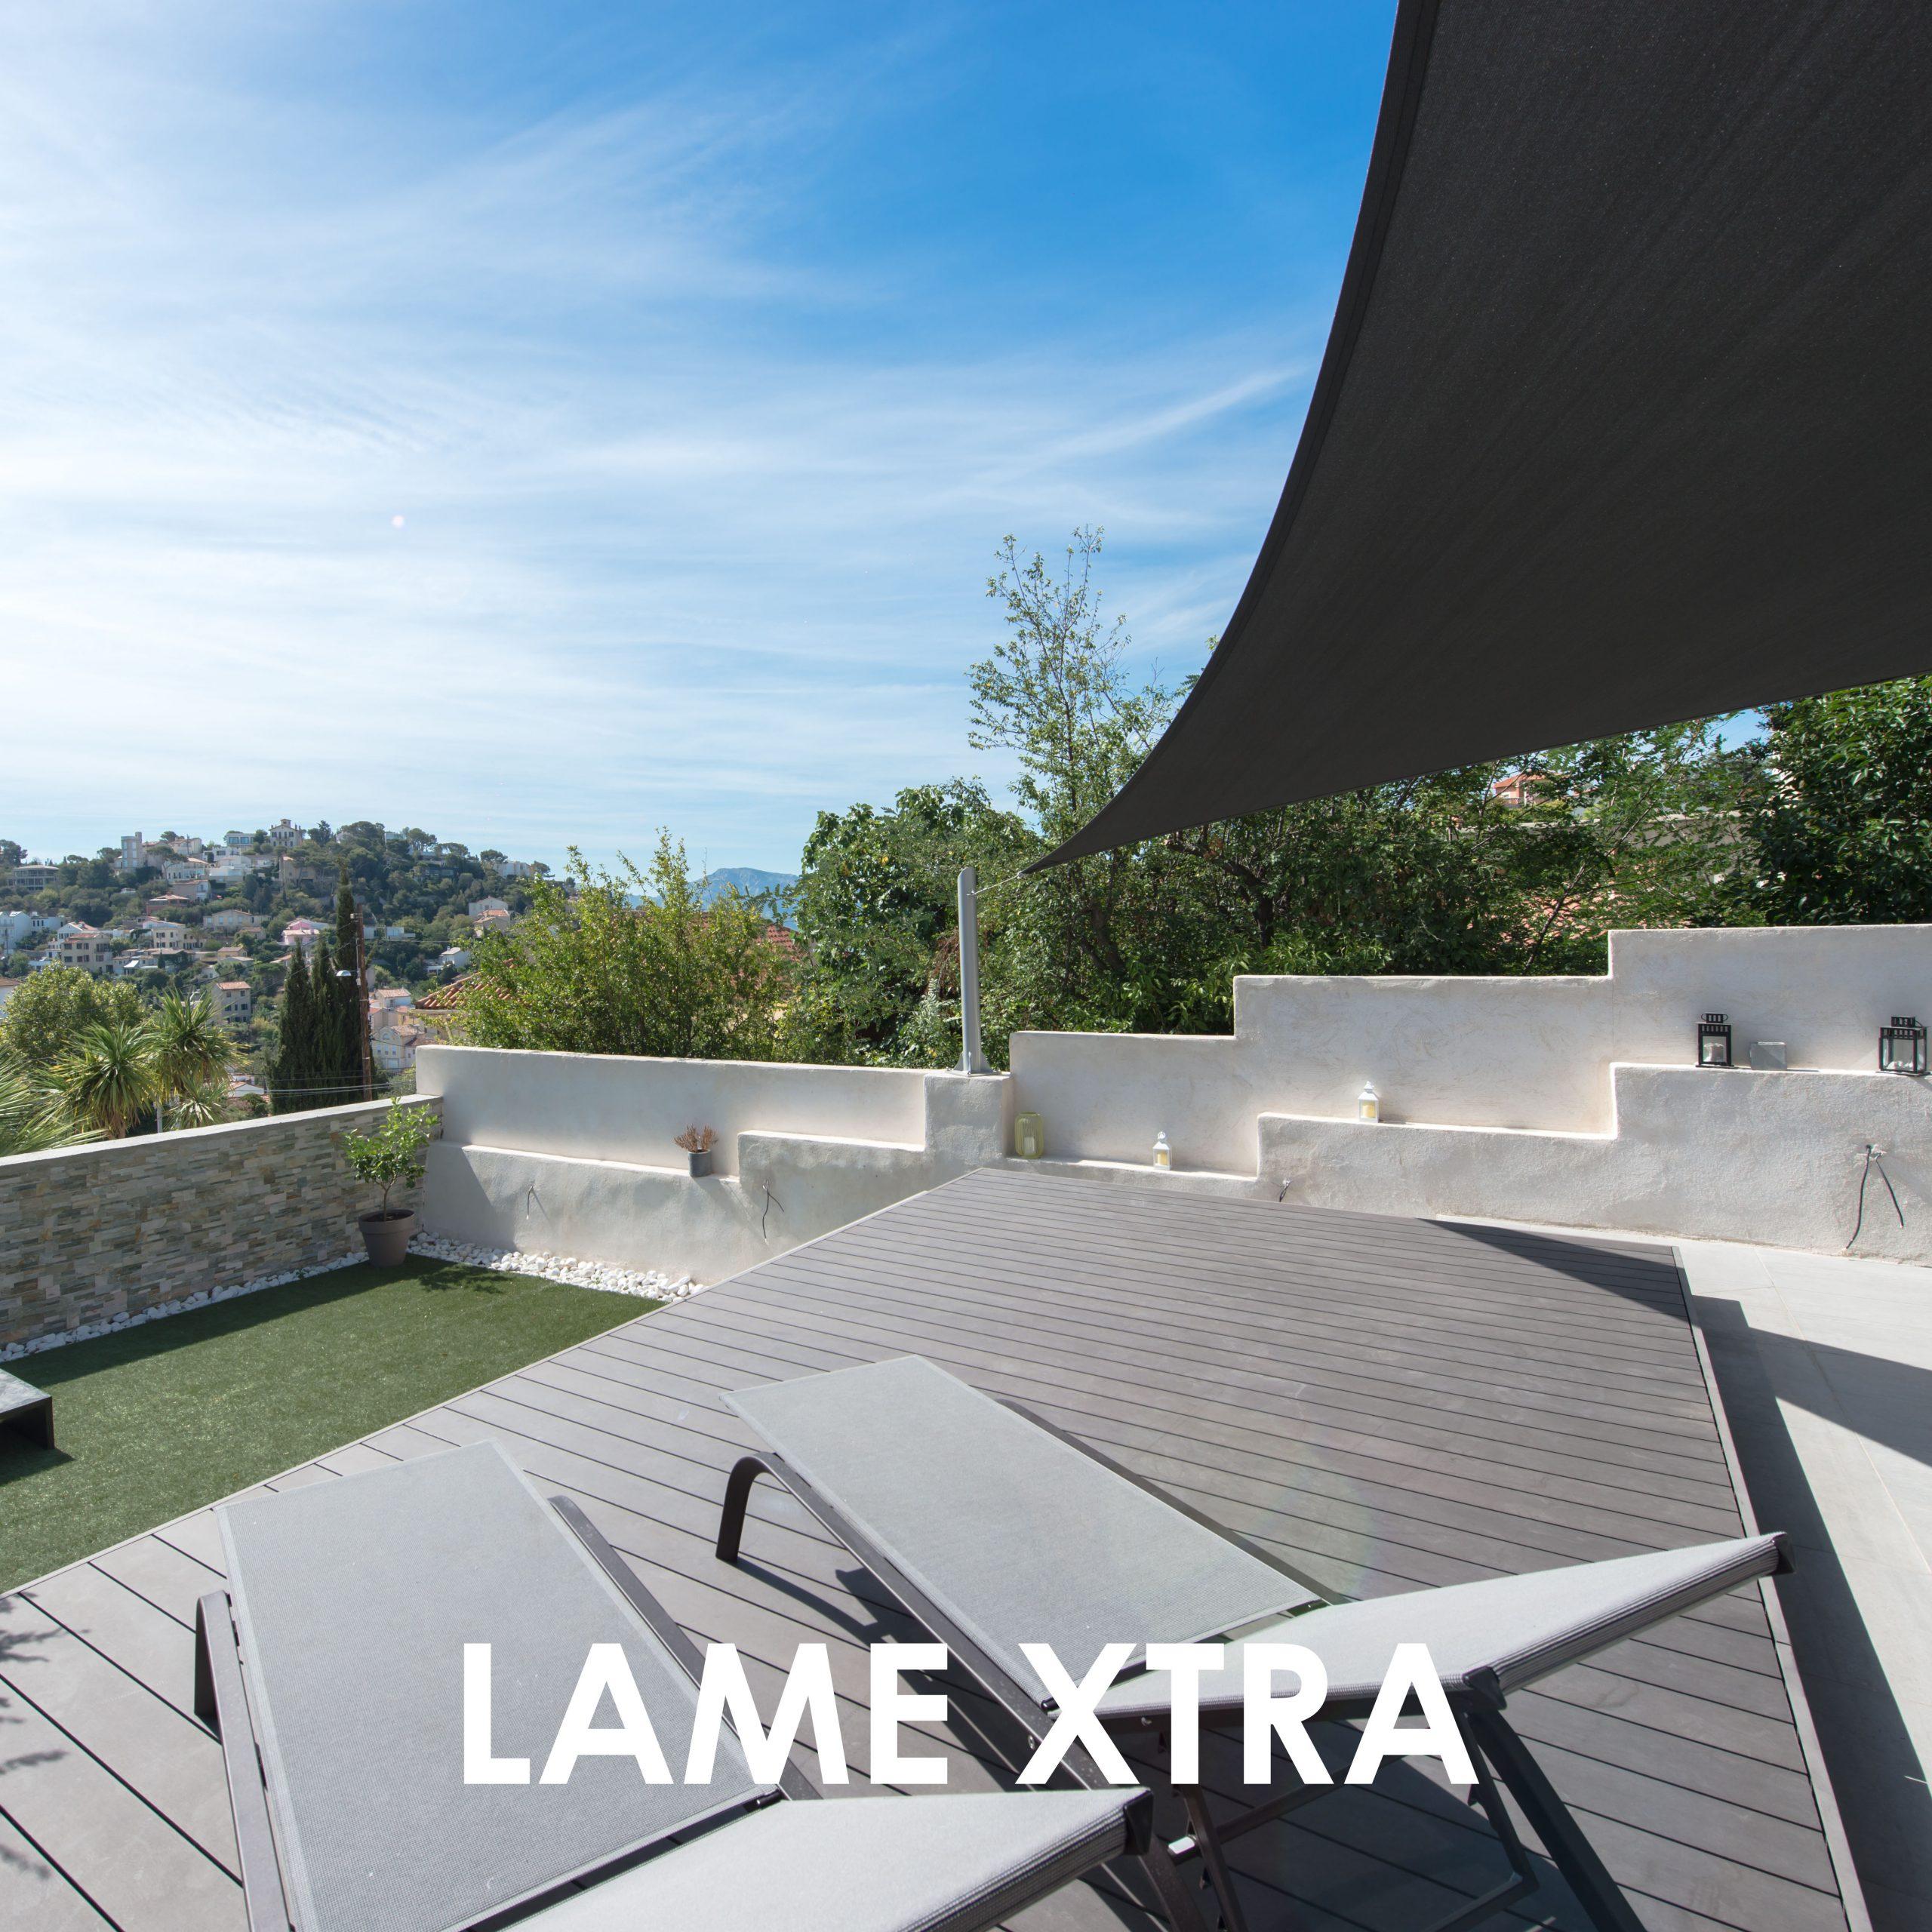 LAMEO - Plate-forme